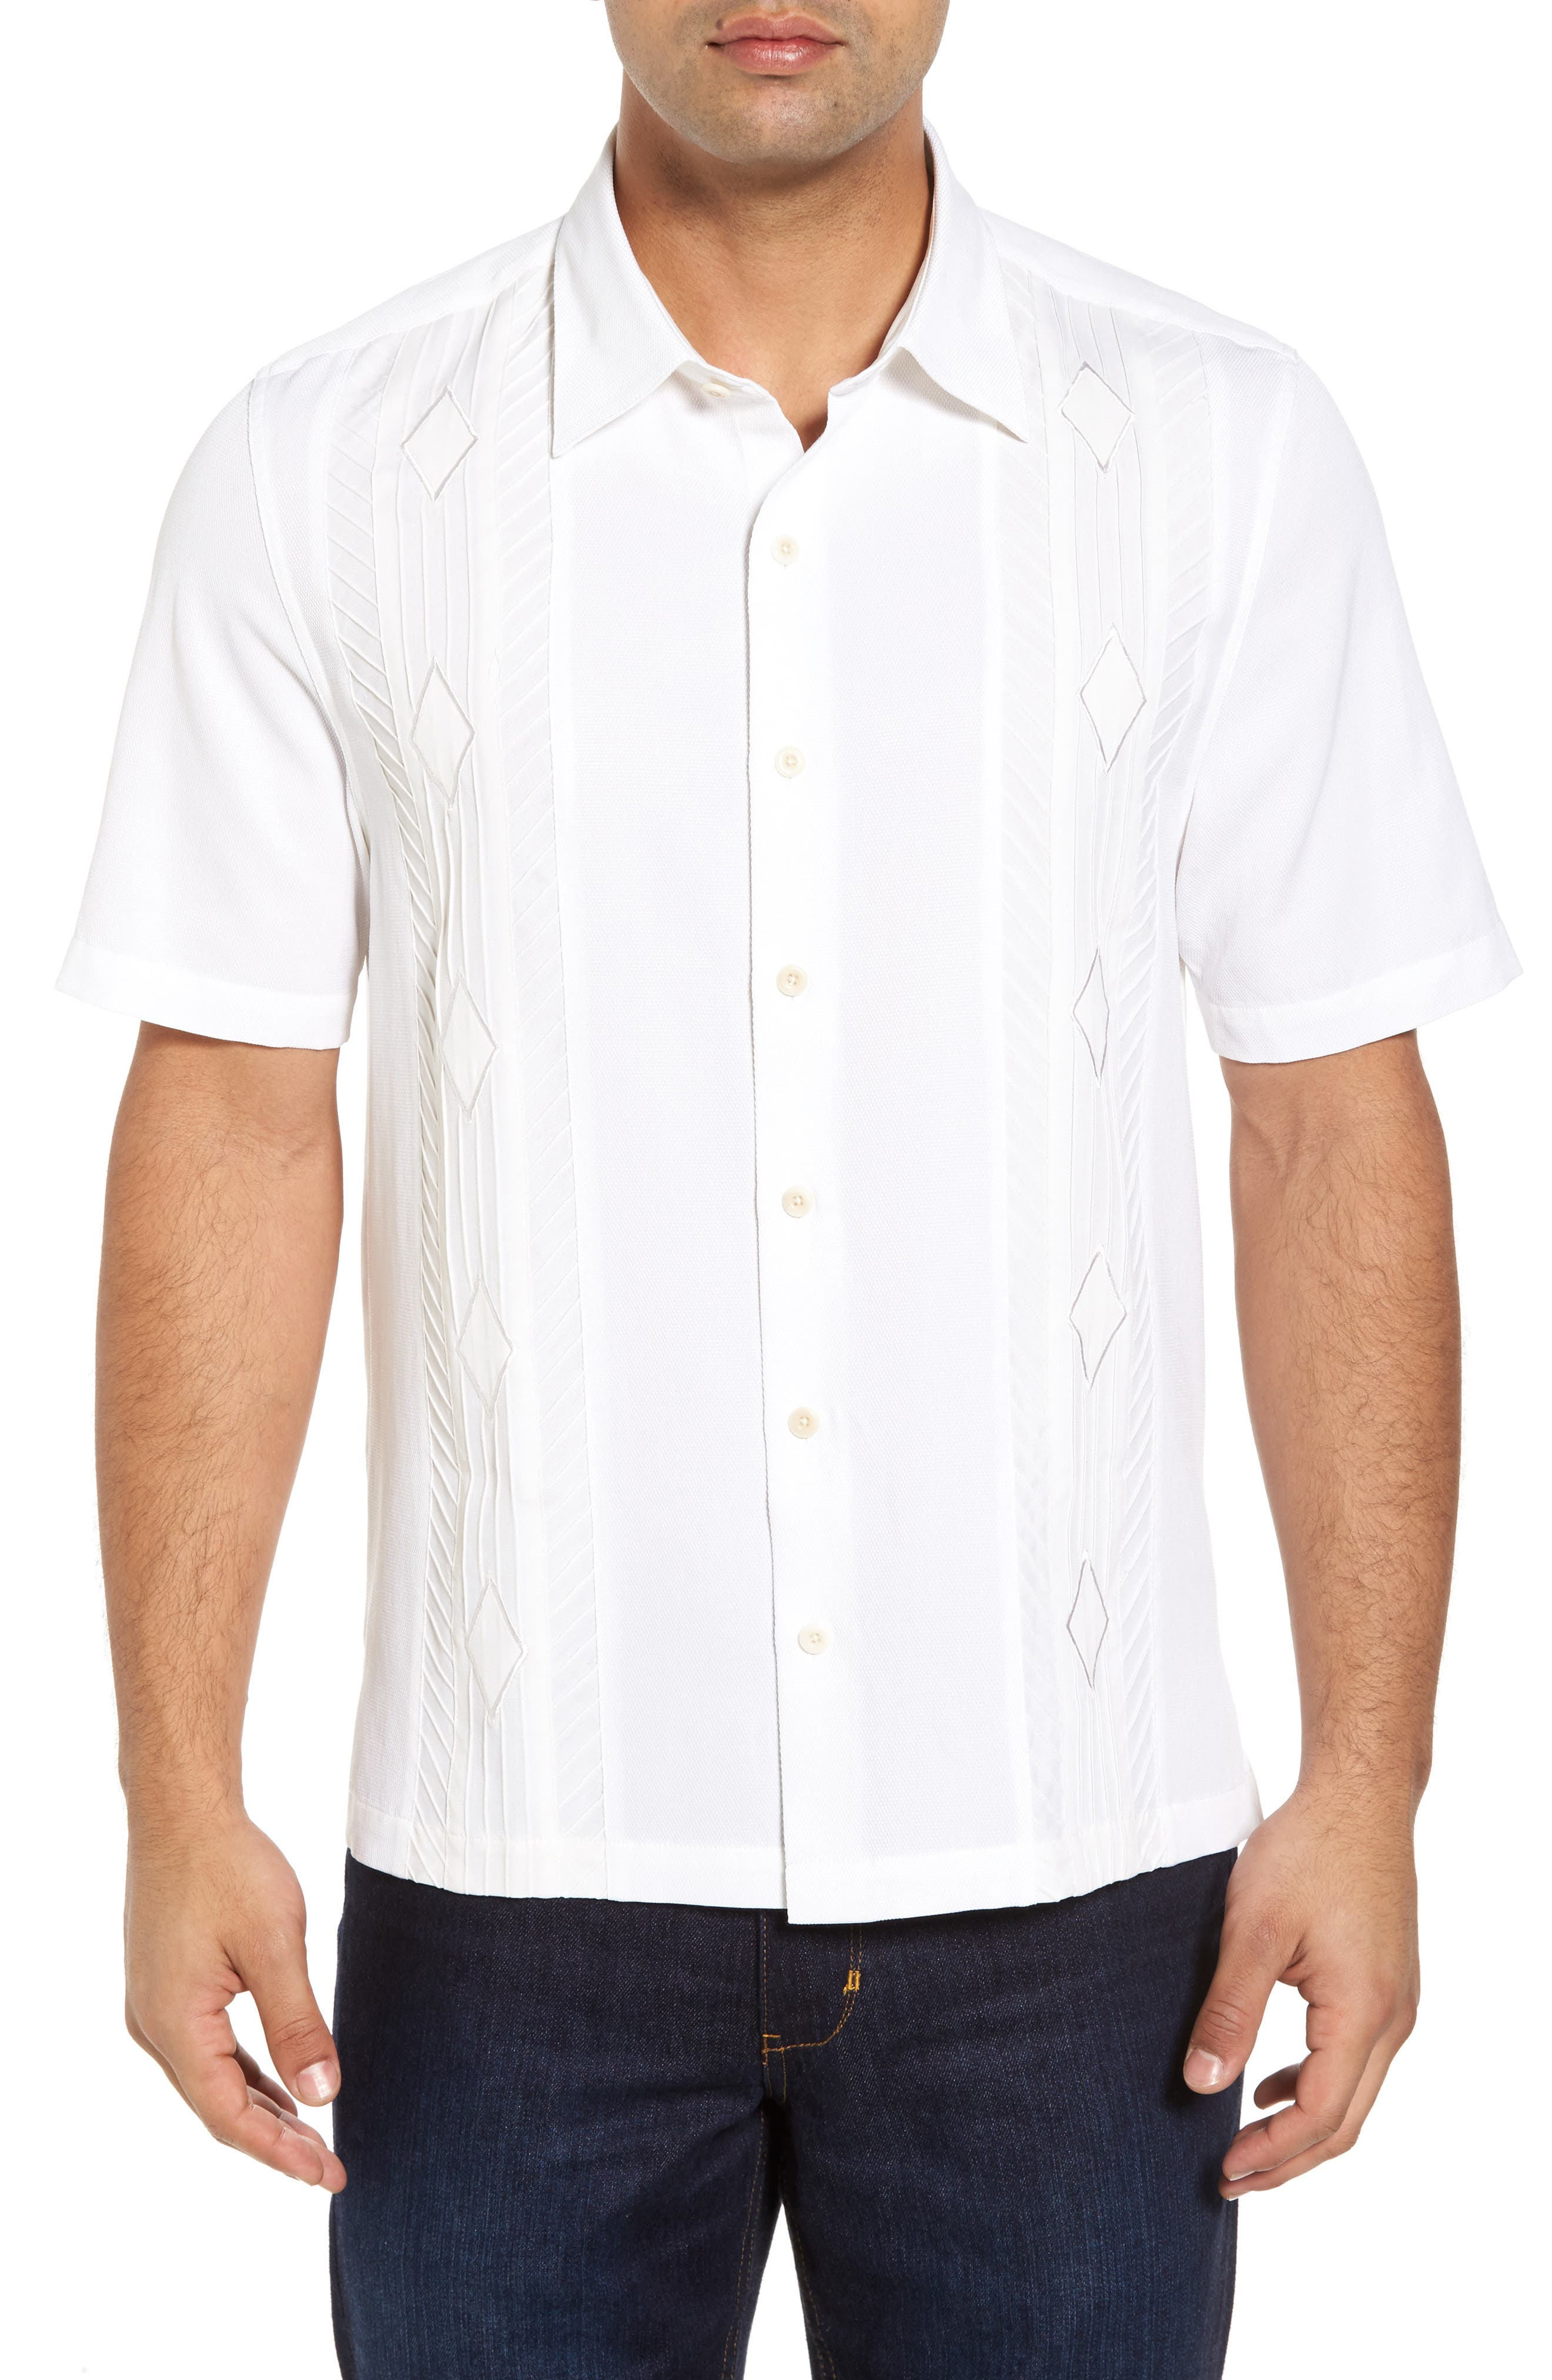 Gondola Embroidered Jacquard Silk Blend Sport Shirt,                             Main thumbnail 1, color,